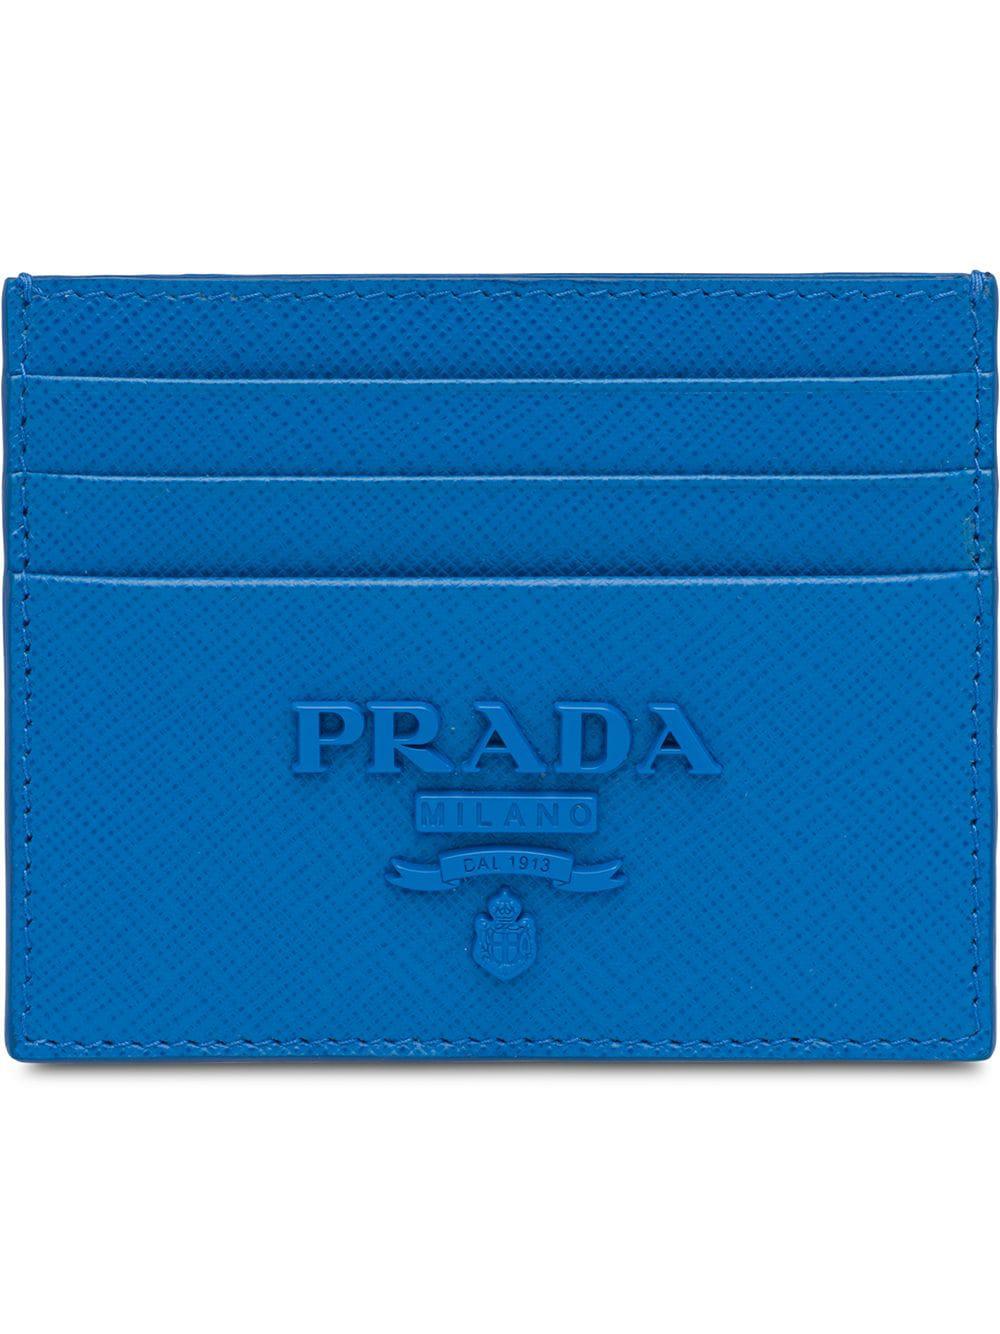 8b10daf6f8fa Prada Saffiano Leather Card Holder - Blue   ModeSens